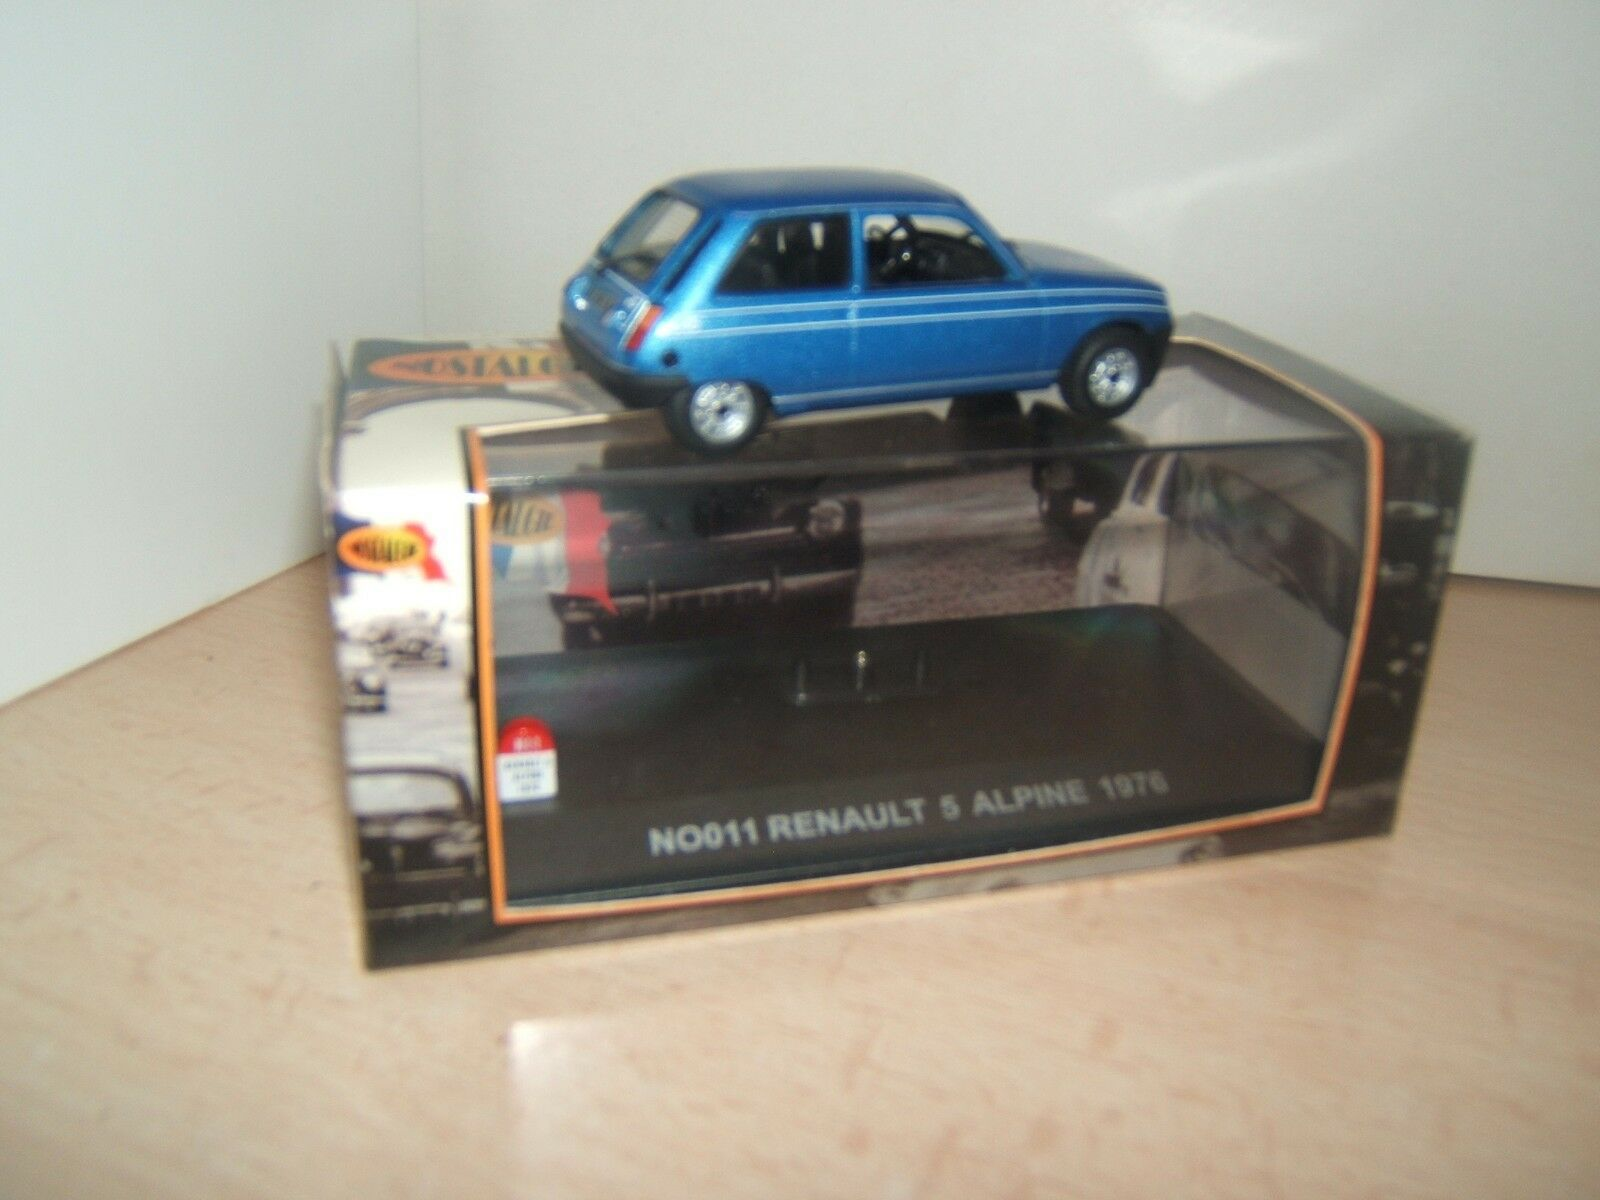 5 Nostalgie Jouets Et Www Renault 1976 1 Jeux Nndsho4500 Alpine 43 ynvN80OPmw